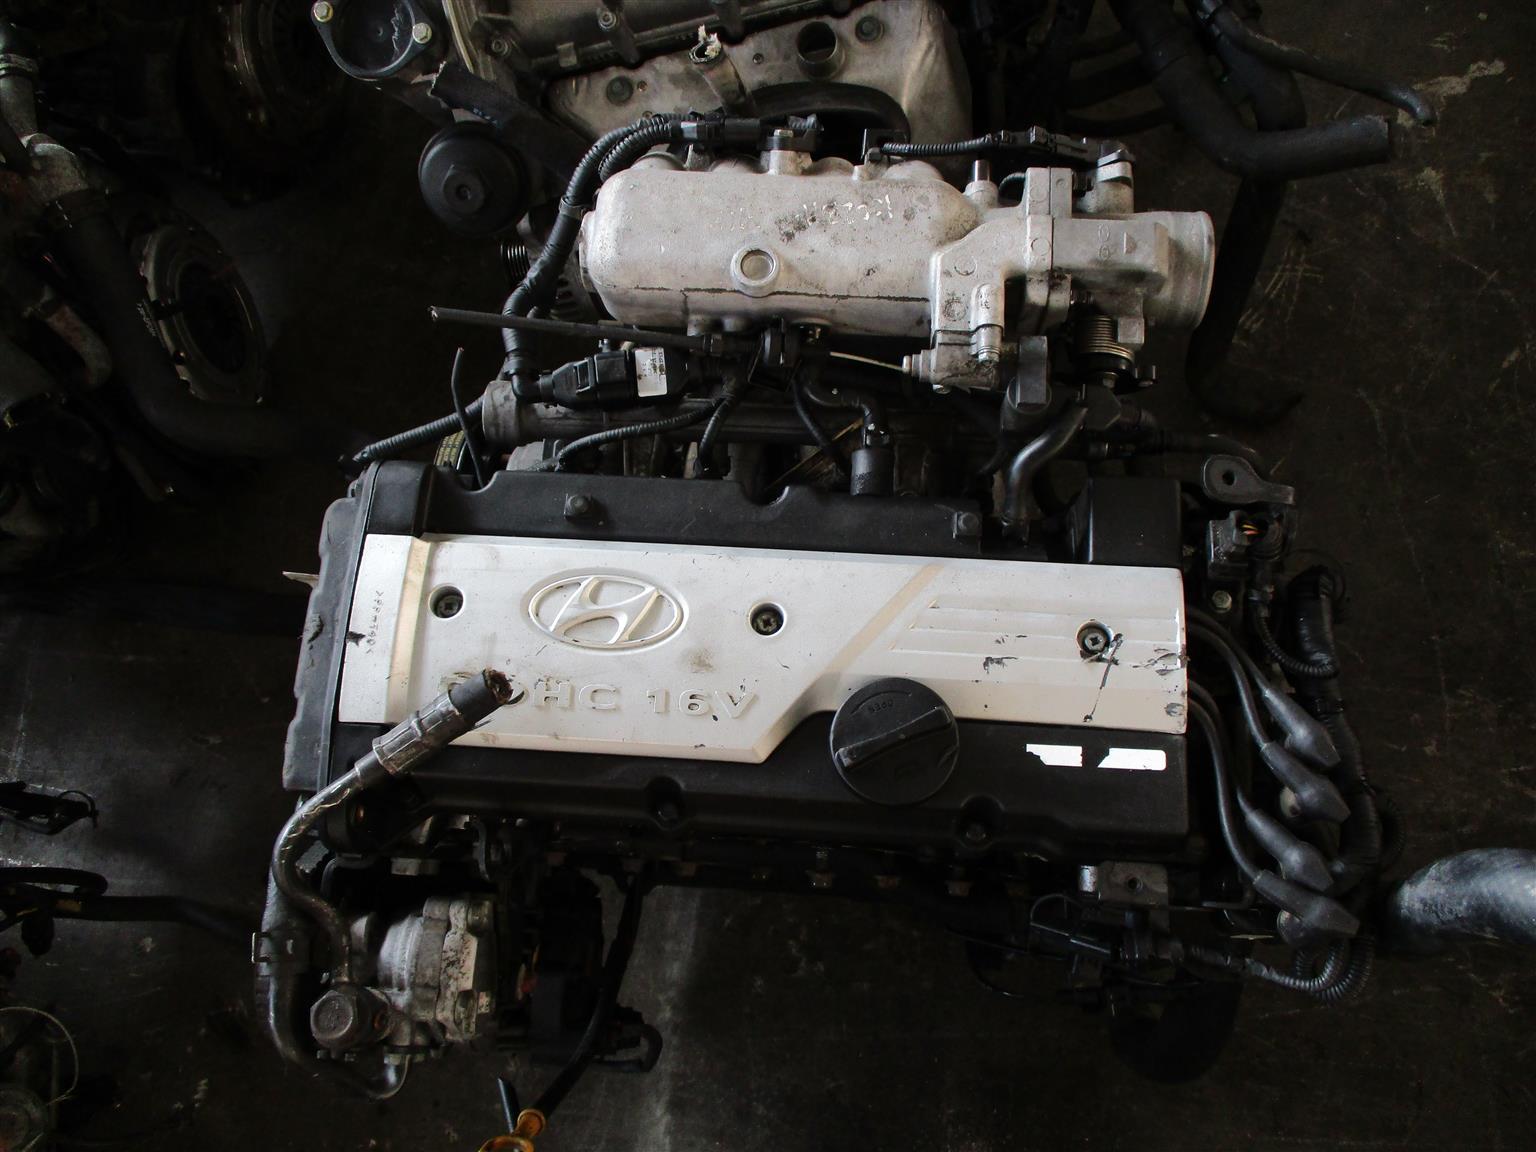 Hyundai Elantra 1.6 GLS Engine for Sale